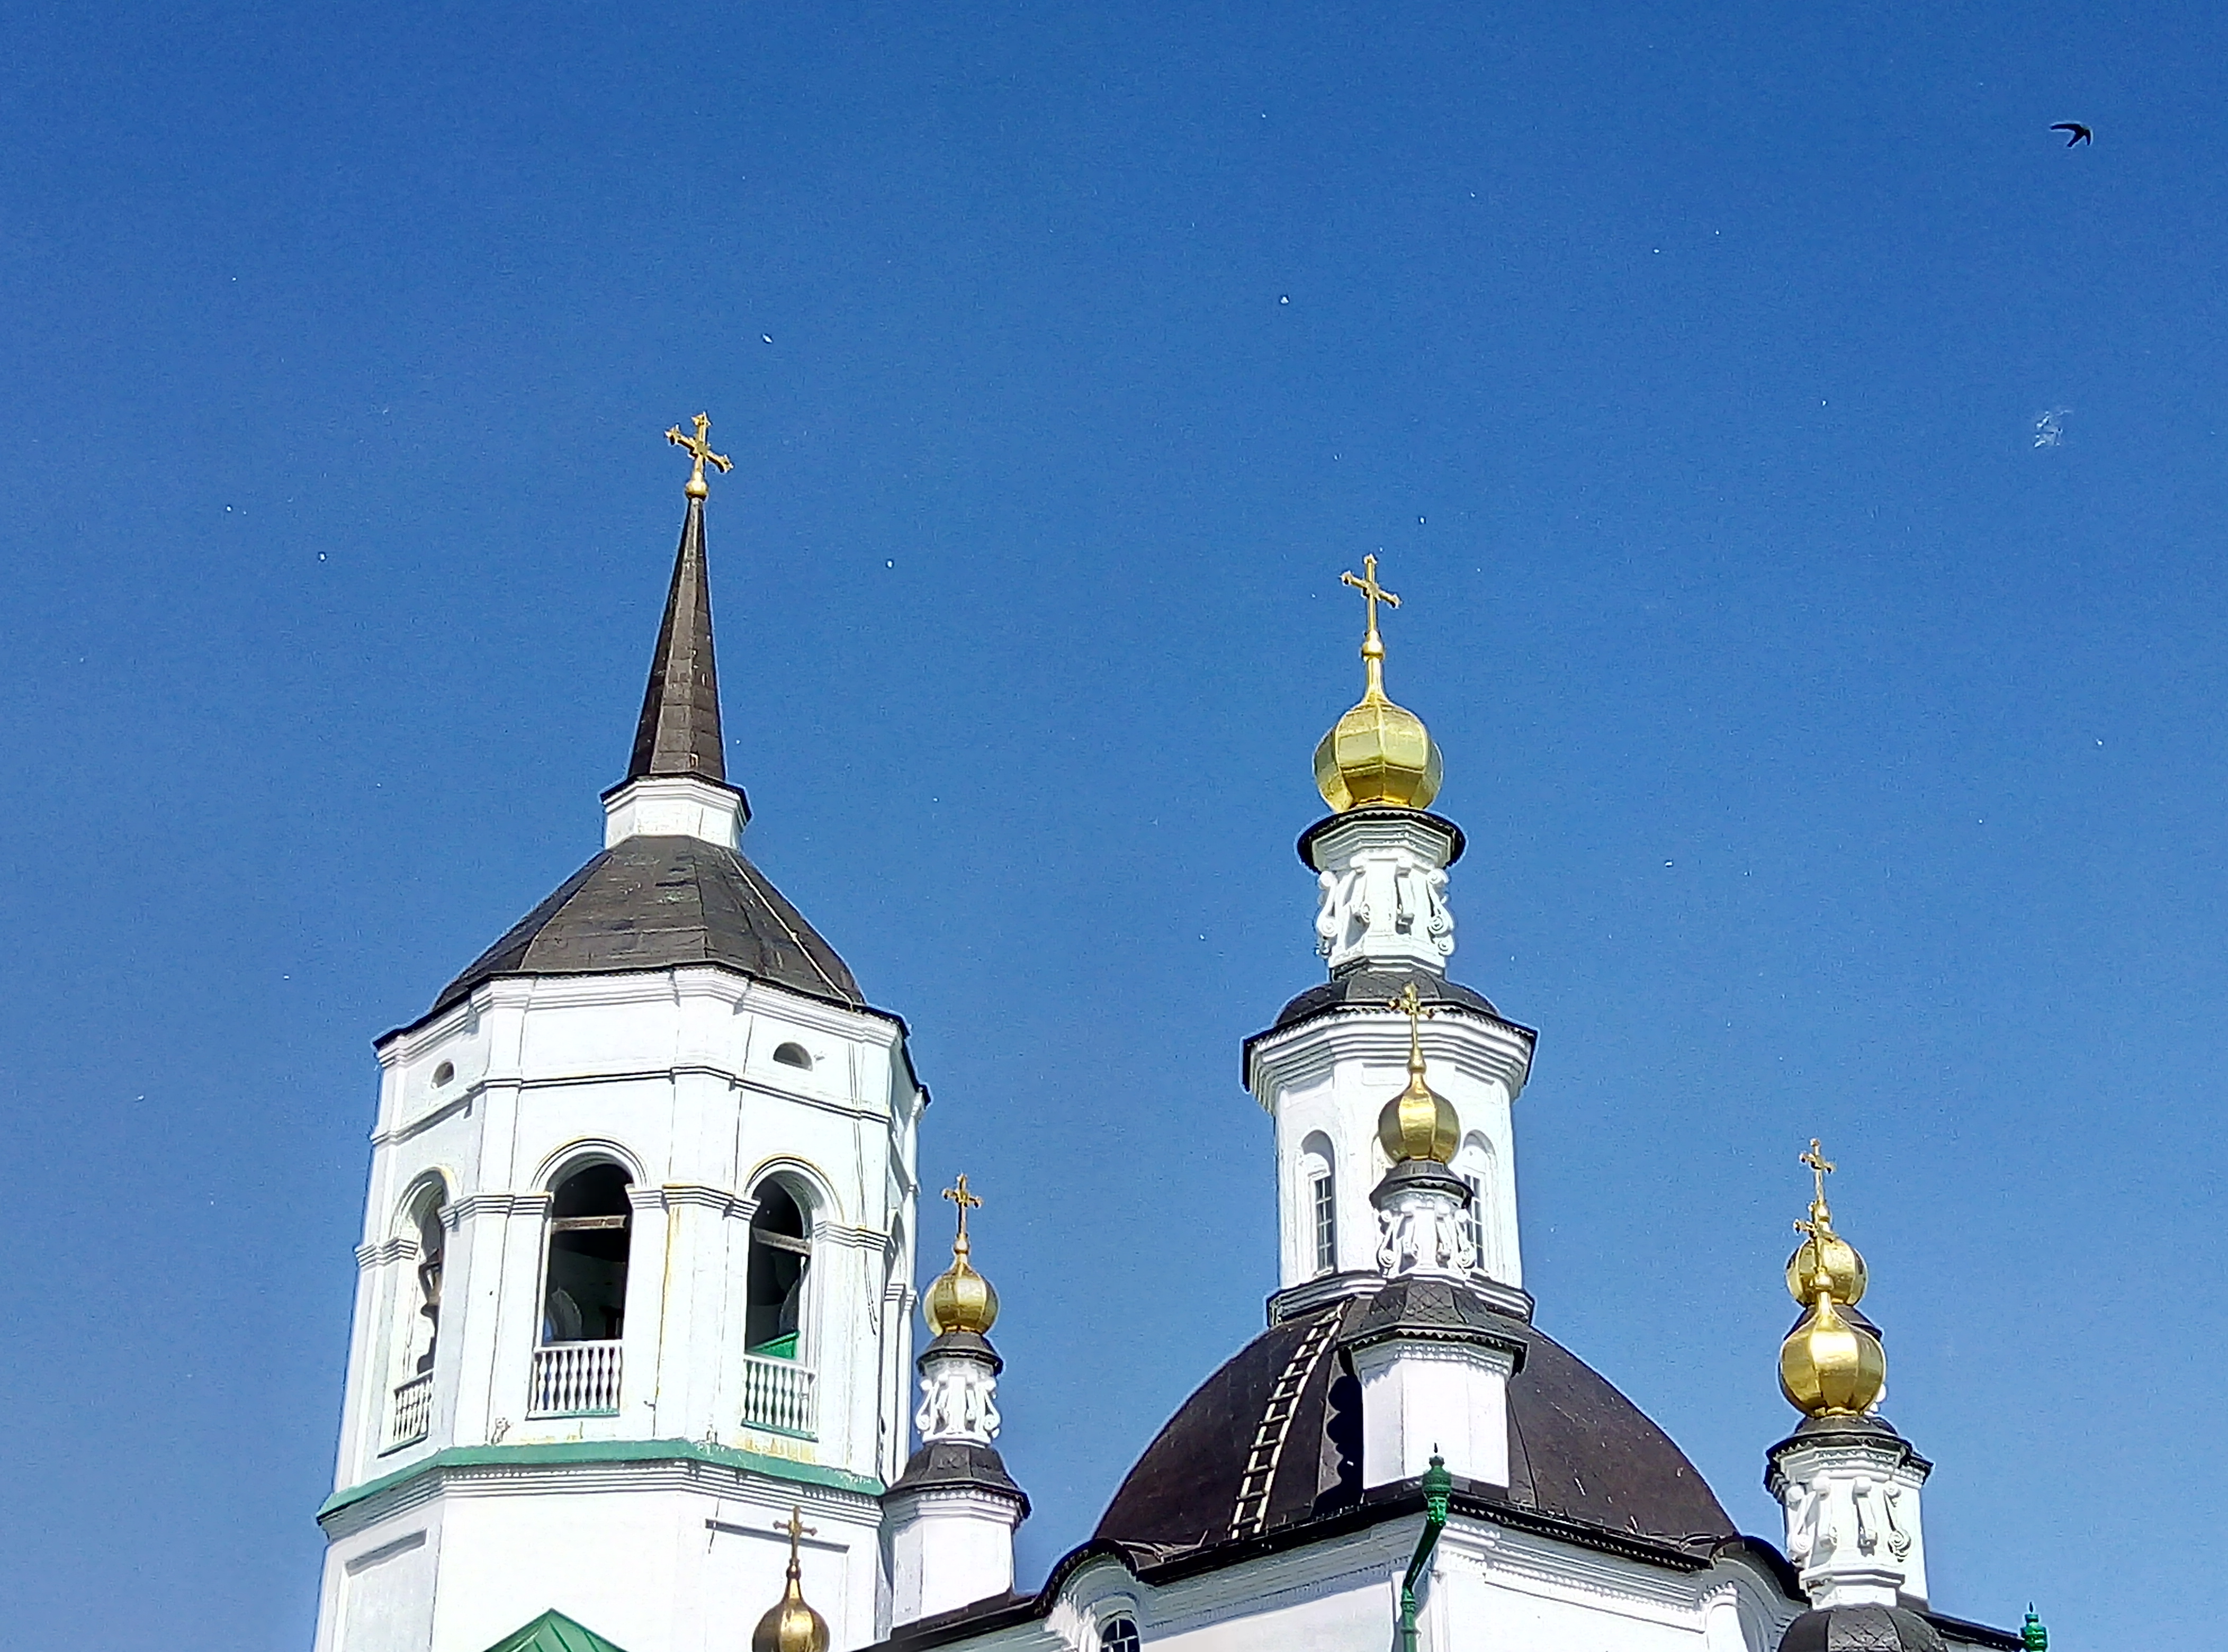 2019 06 27 10 04 52 - Rússia-Tomsk e as igrejas